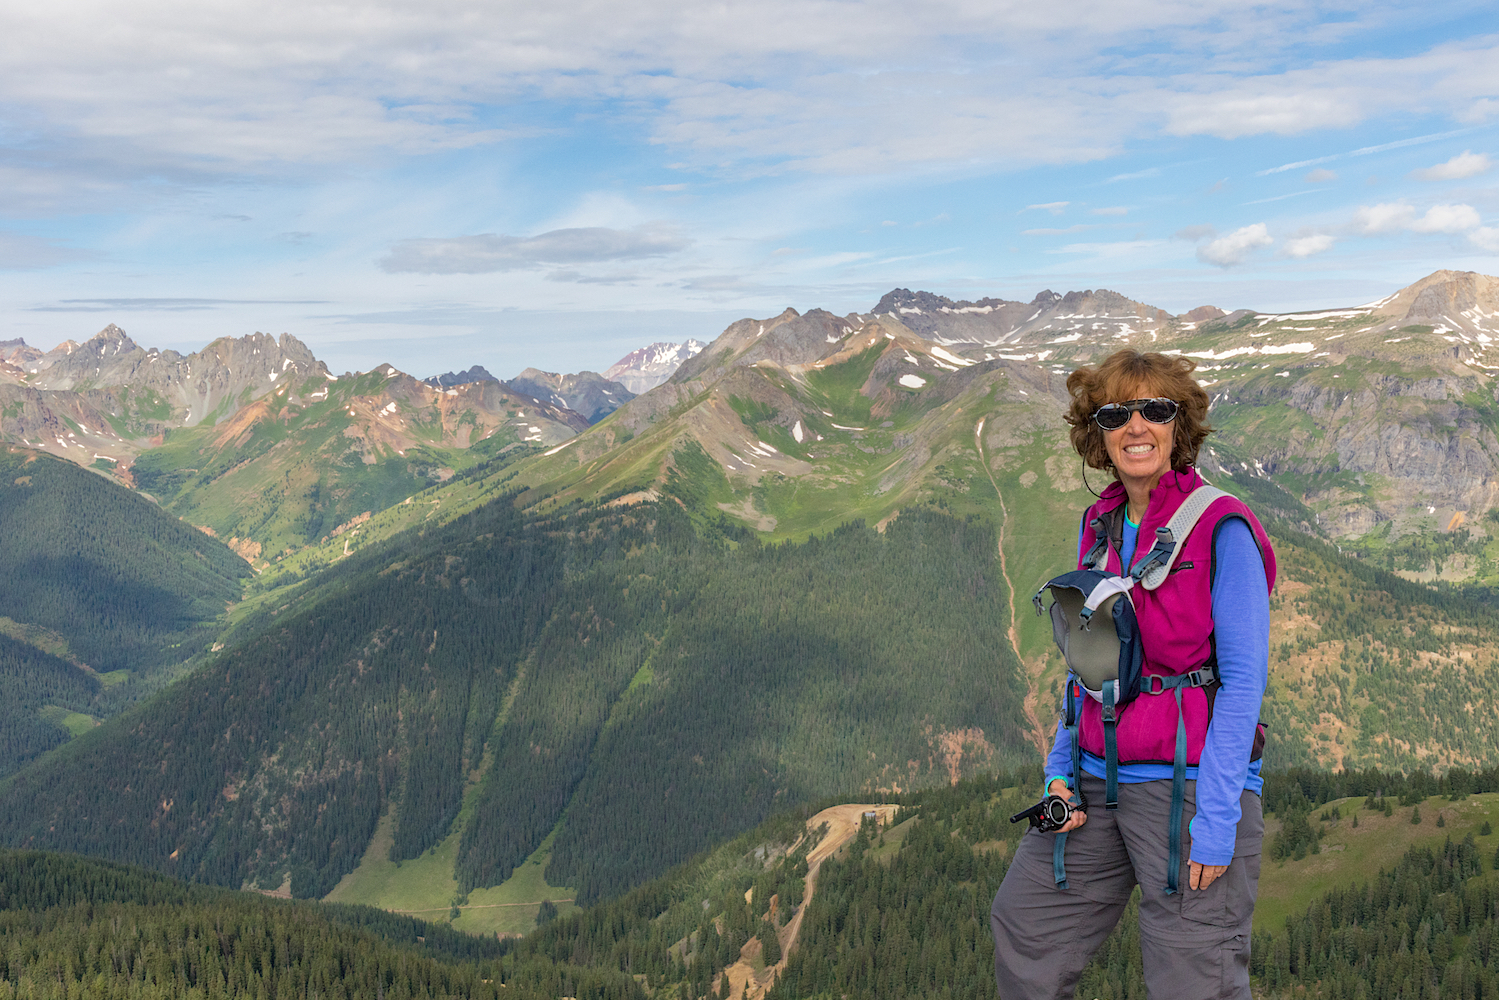 I even got a summit photo..courtesy of Penny Jones